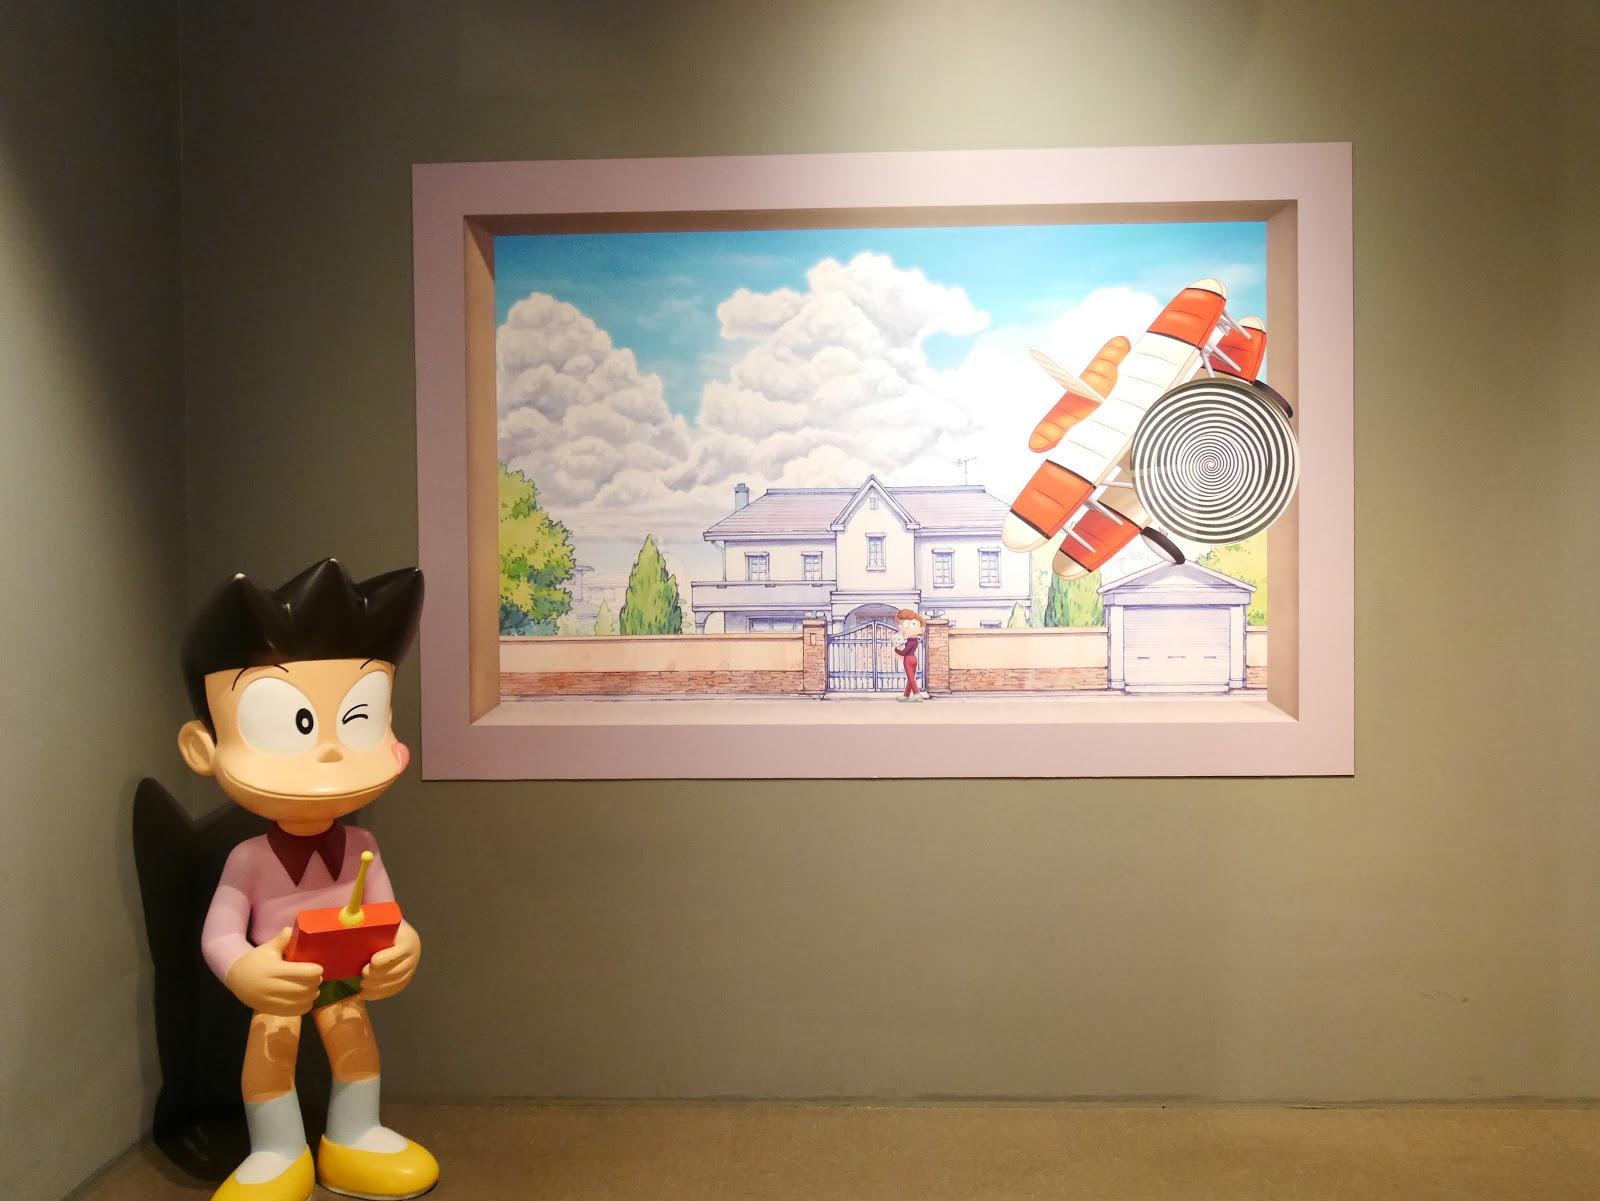 Entry Bergambar Hokkaido Day 1 Media Panas Tcash Vaganza 17 Kk New Motif 2016 I Beriya Buat Muka Kagum Sebab Ingat Robot Pastu Diorang Gelak2 Pun Tak Tahu La Ni Ke Manusia Maka Berhuhuhu Jela Comel Awek Jepun Tu